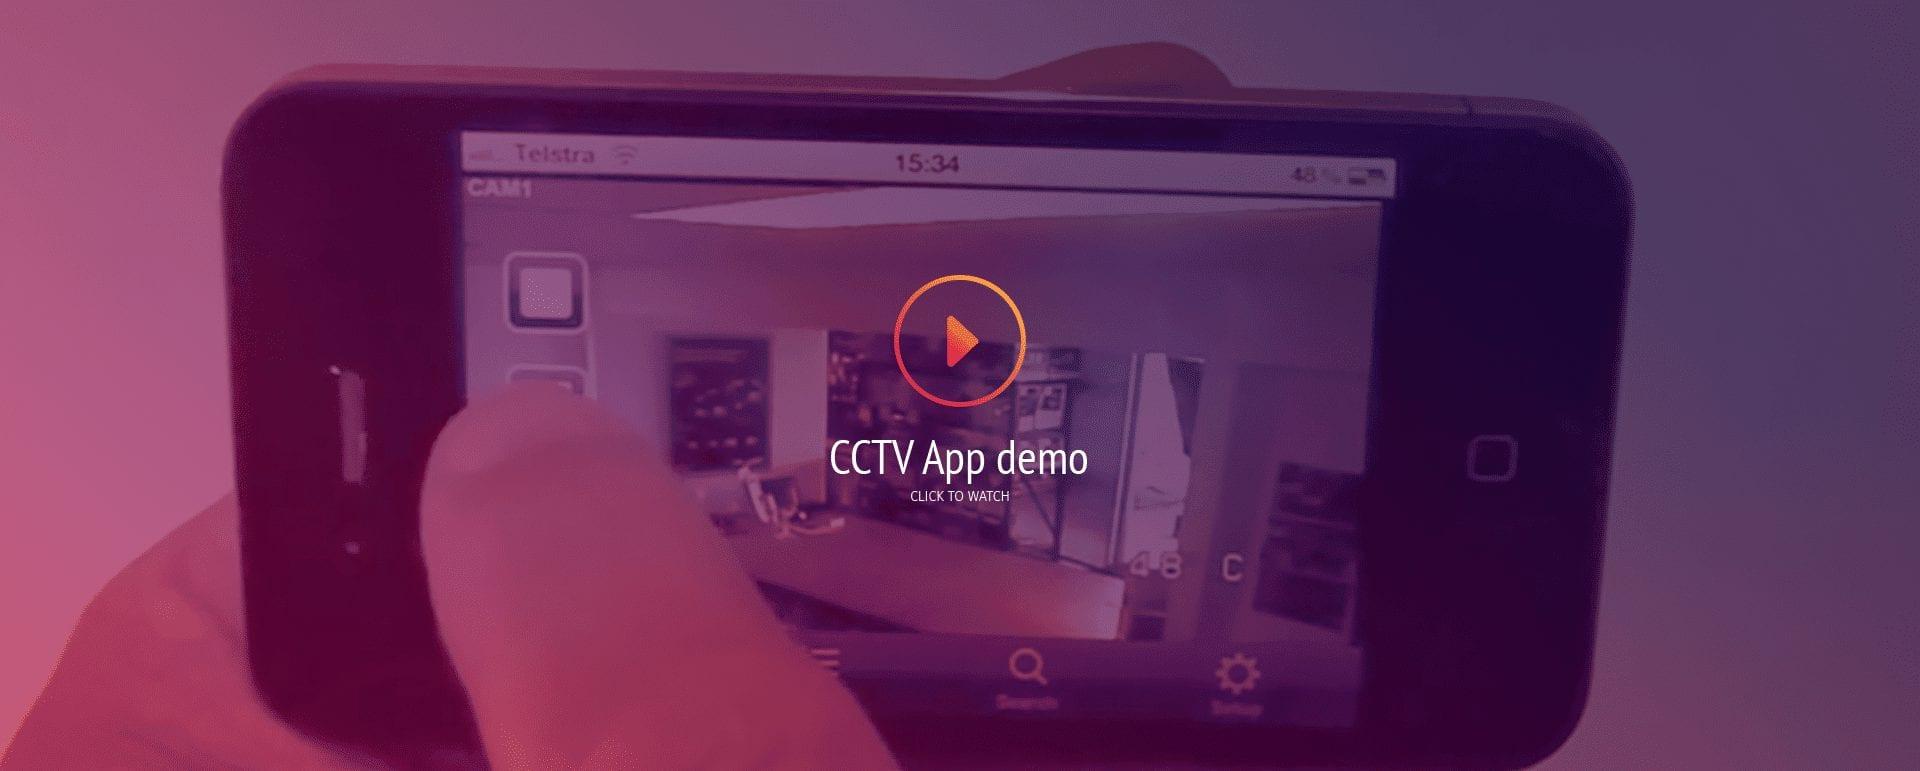 CCTV-App-DEMO-v1